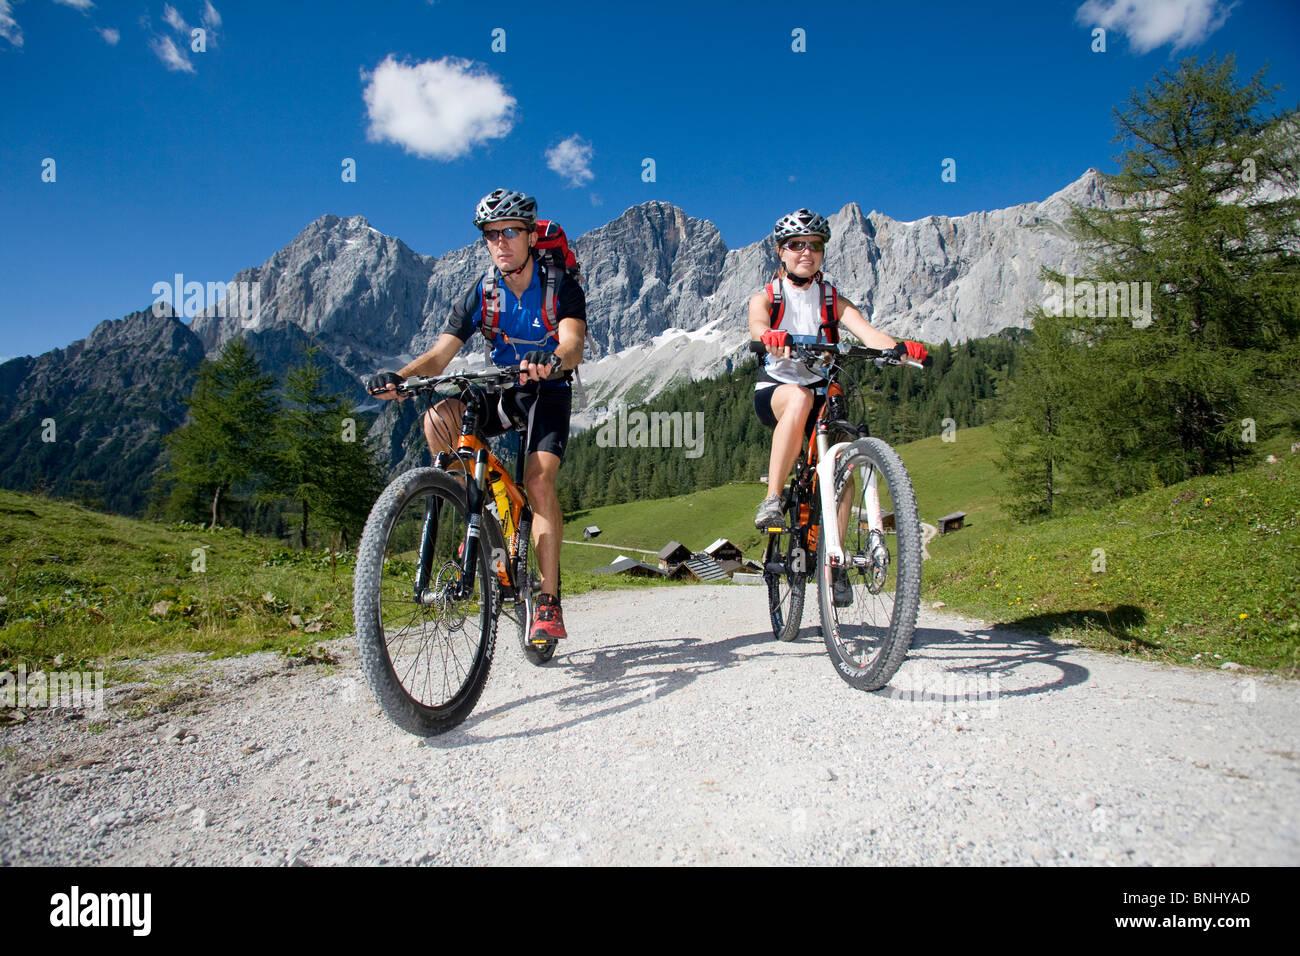 Bike Austria Ramsau Dachstein Styria summer alp mountain alps alpine mountains landscape scenery nature Bicycle - Stock Image